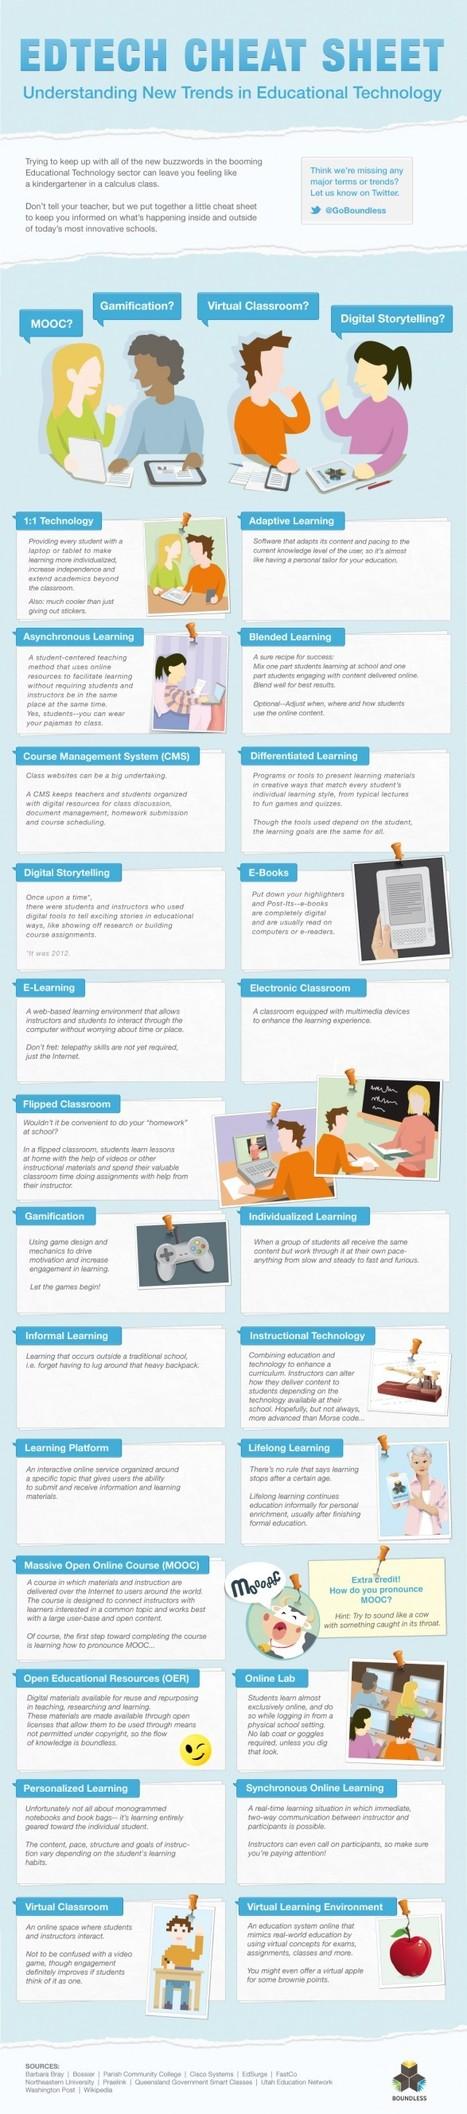 EdTech Cheat Sheet Infographic | Ed Tech Highlights | Scoop.it